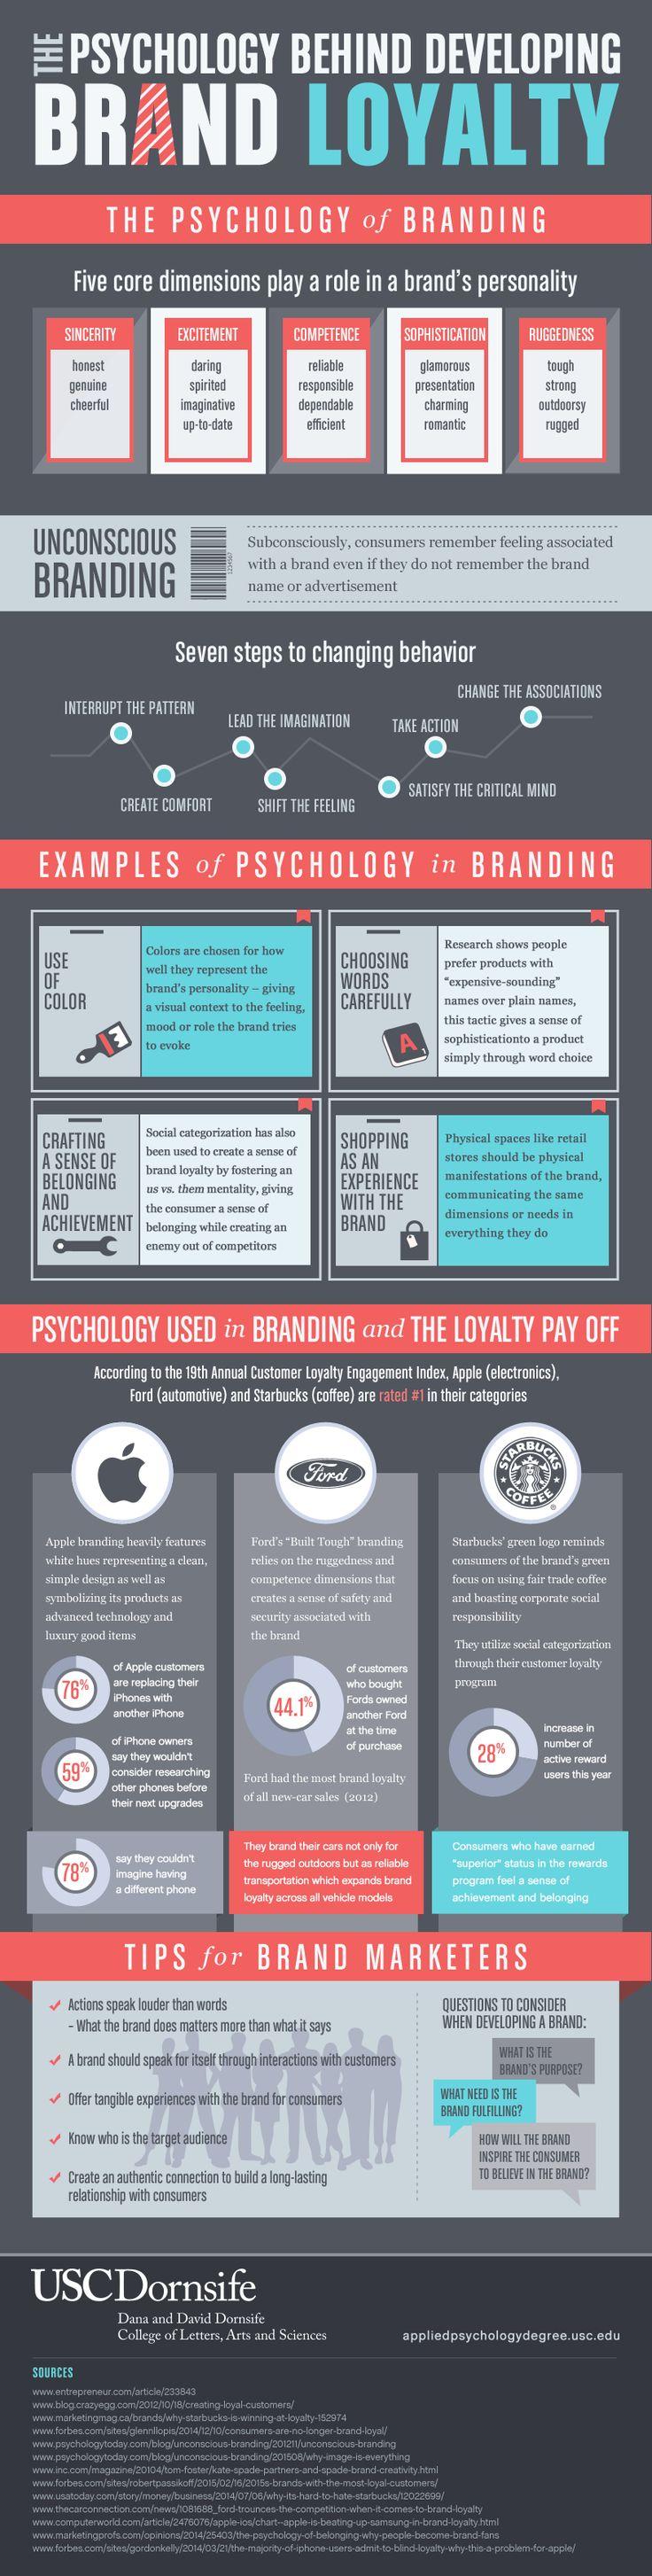 Psychology Behind Developing Brand Loyalty #Infographic #Branding #Psychology